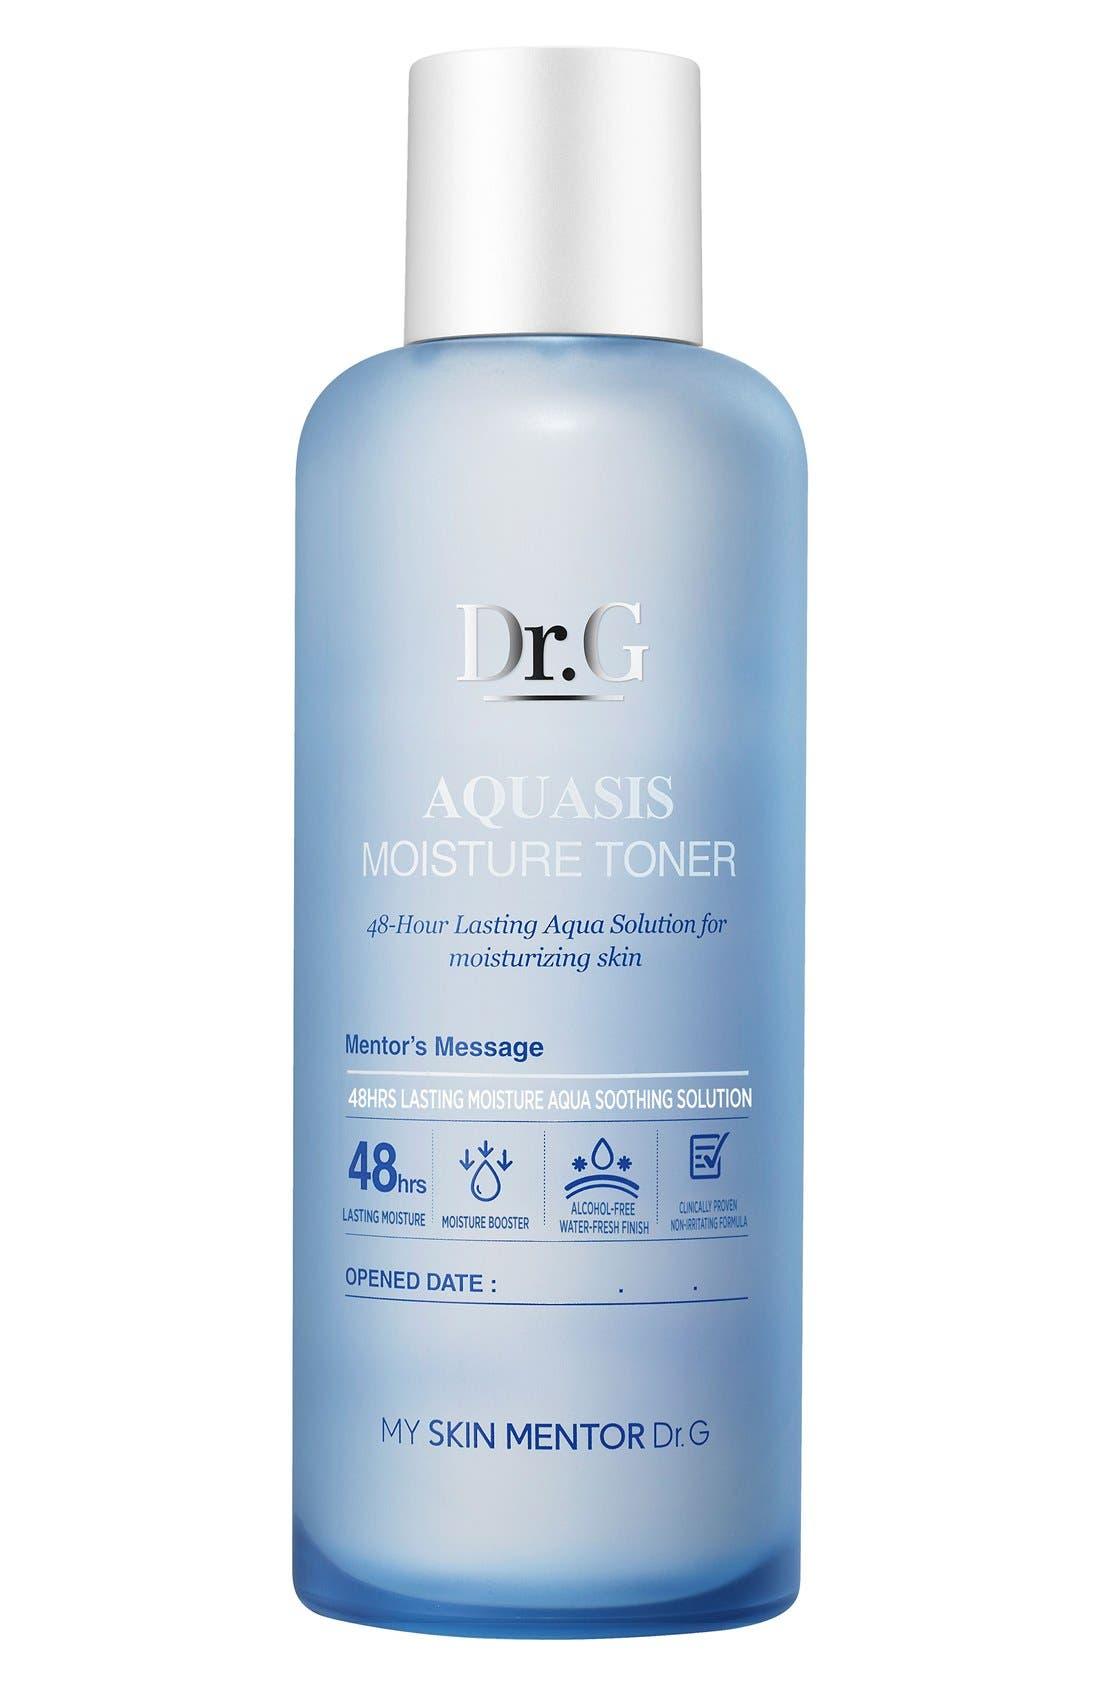 My Skin Mentor Dr. G Beauty Aquasis Moisture Toner